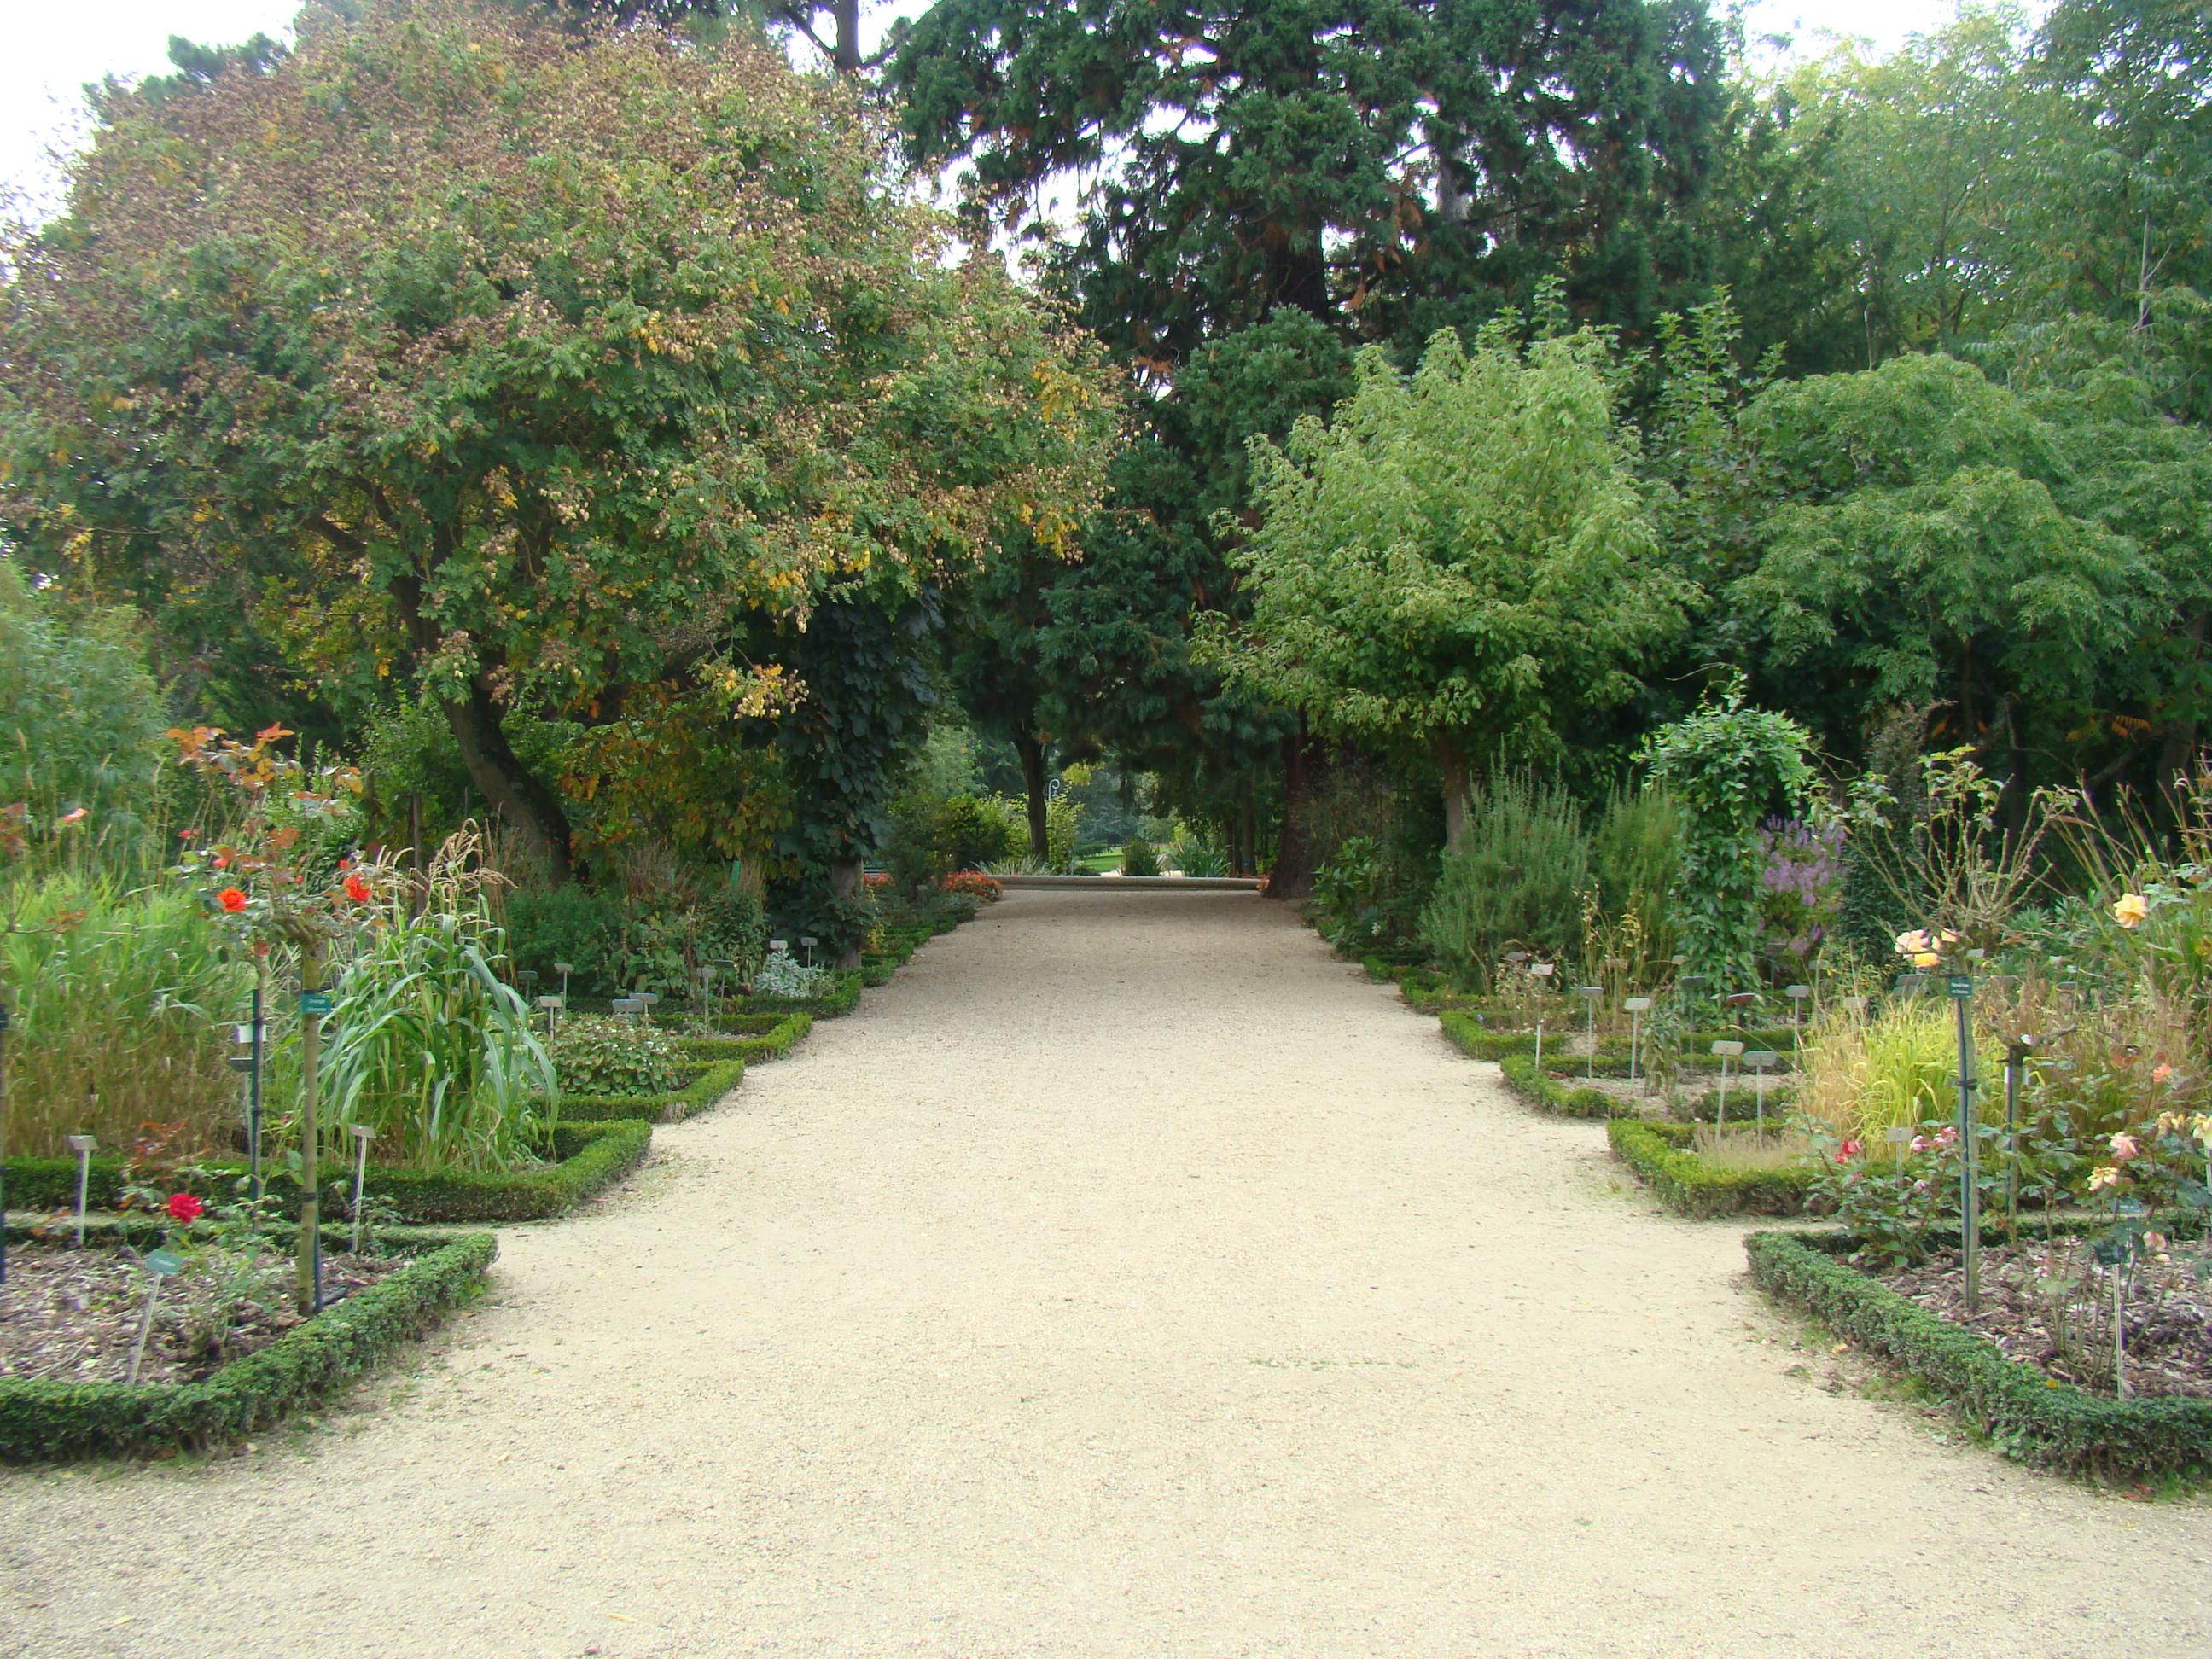 File:Allée Jardin botanique.JPG - Wikimedia Commons